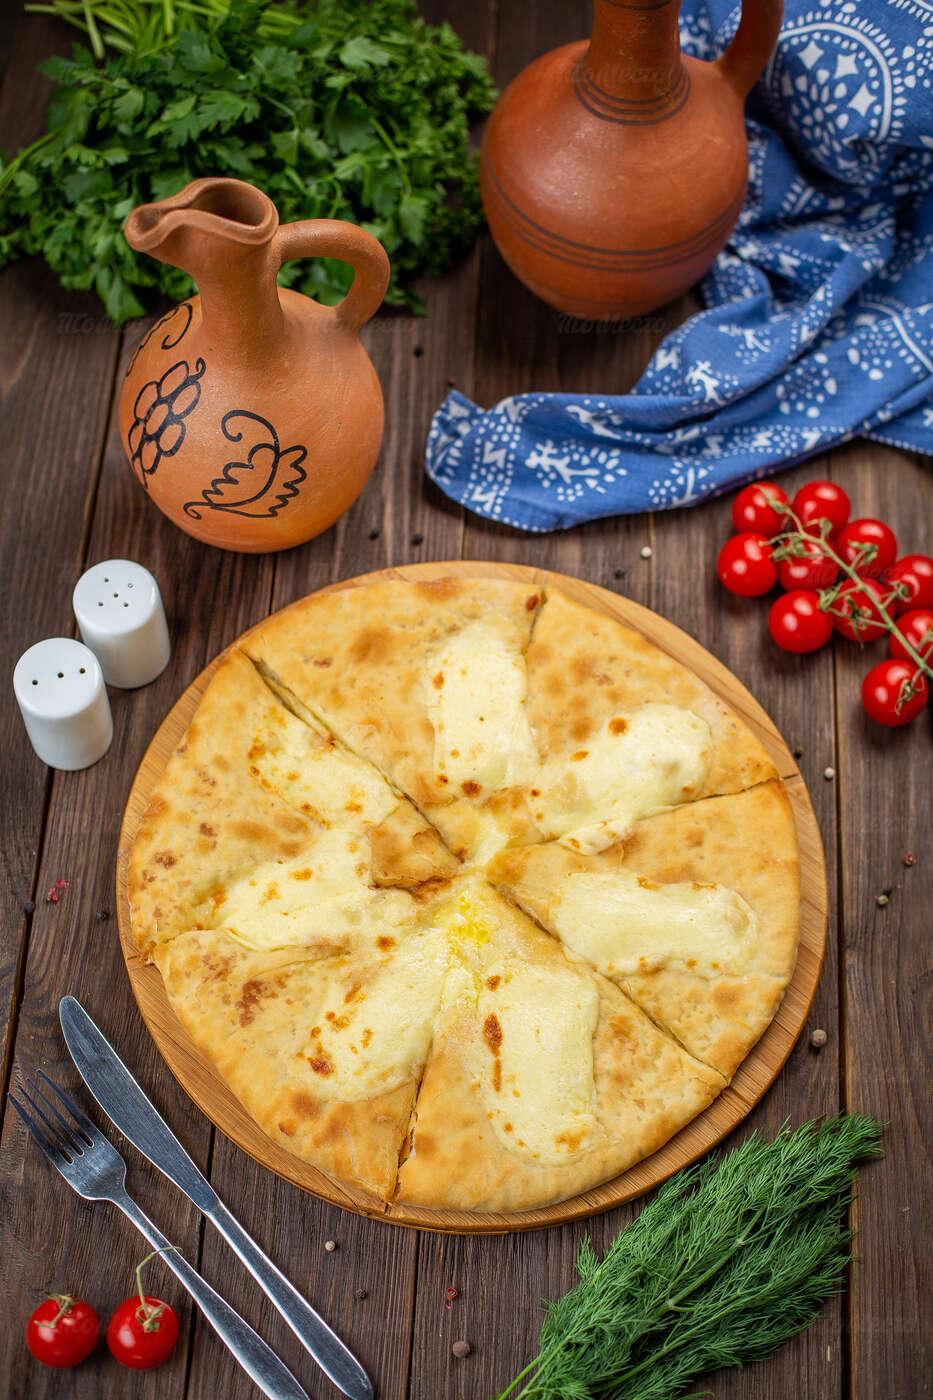 Меню кафе Хинкали & Хачапури на Льва Толстого фото 10